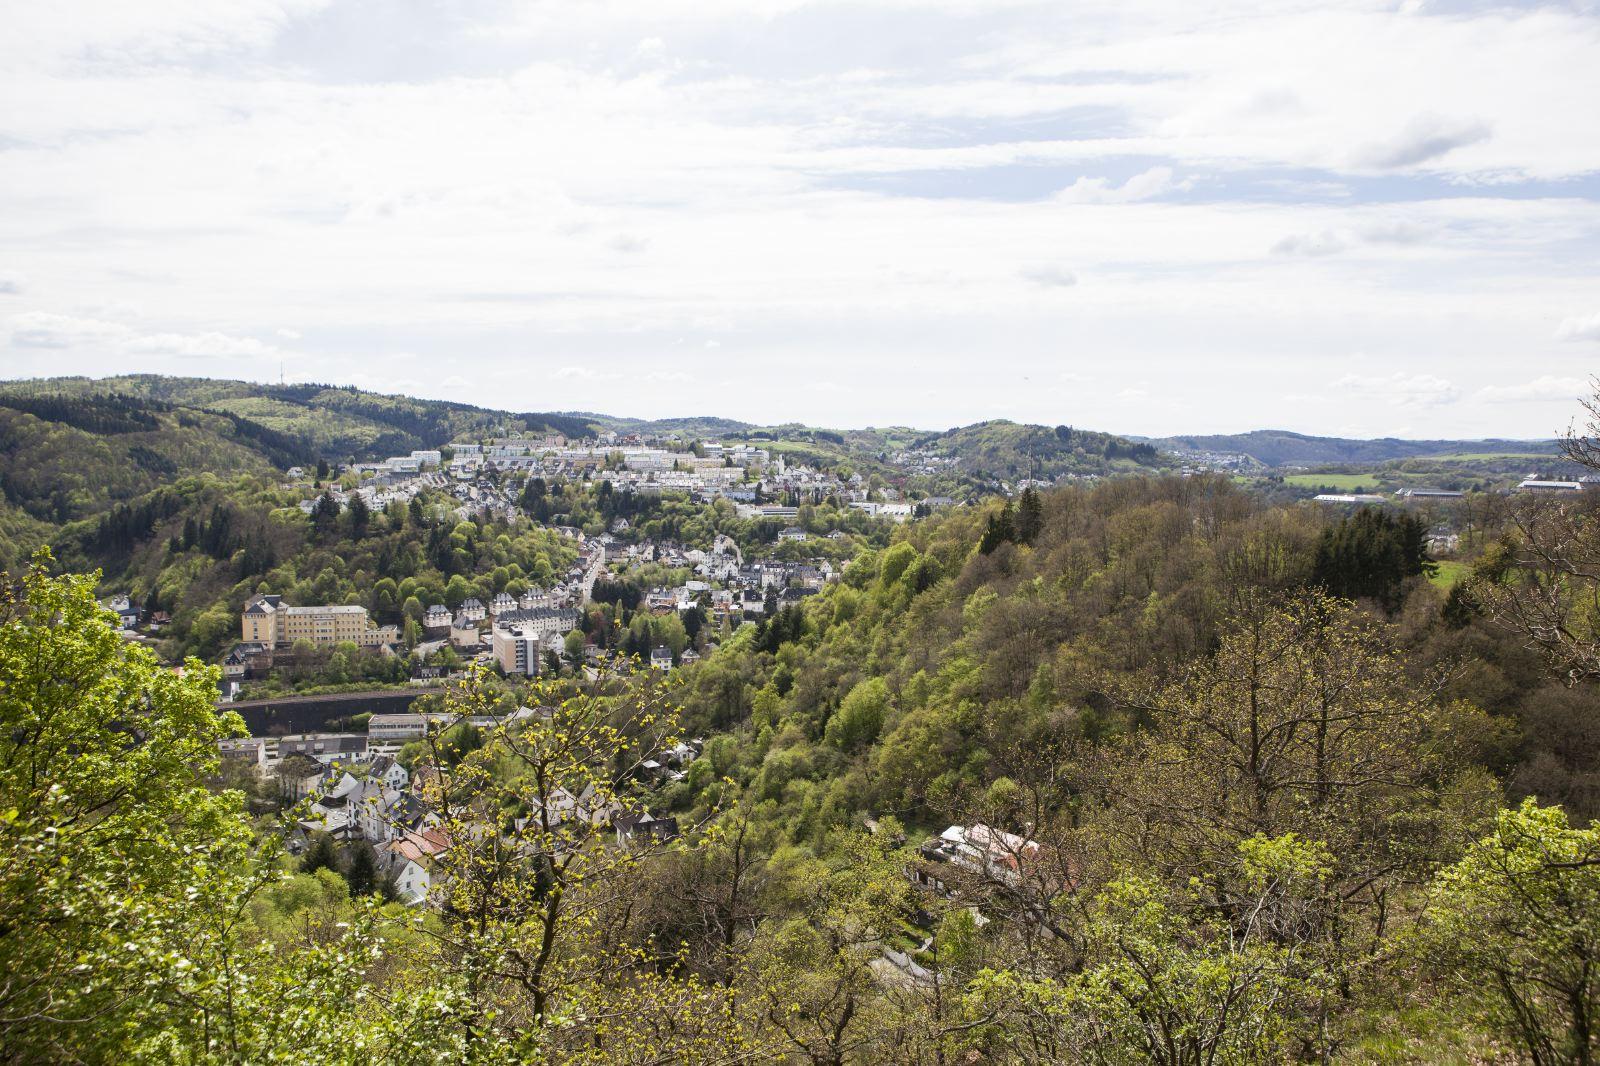 Impression Blick auf Oberstein Nahe Felsen Weg - Foto © Eike Dubois,PHORMAT